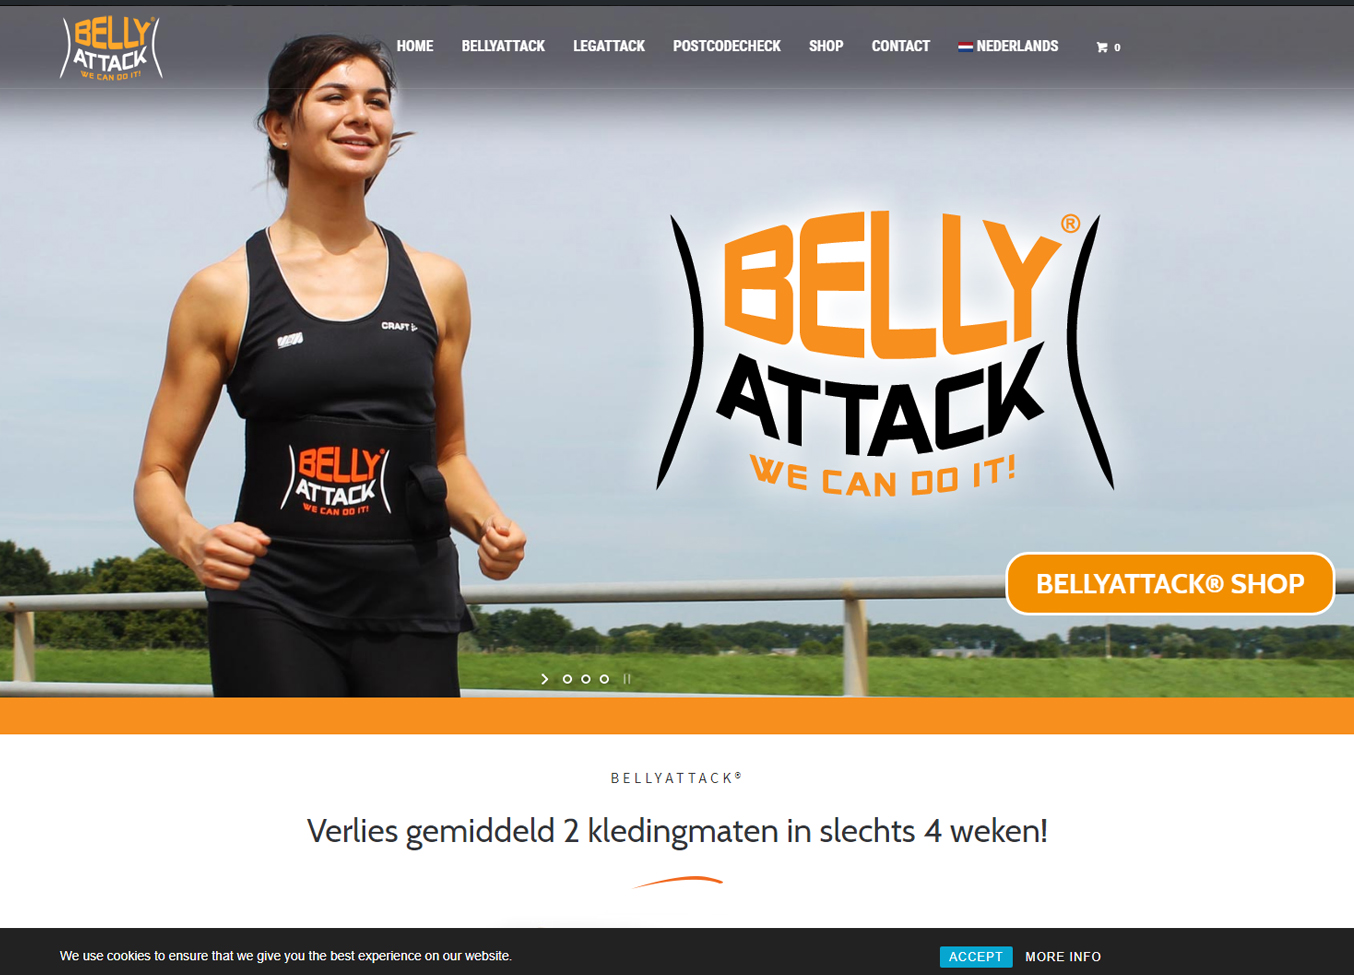 BellyAttack